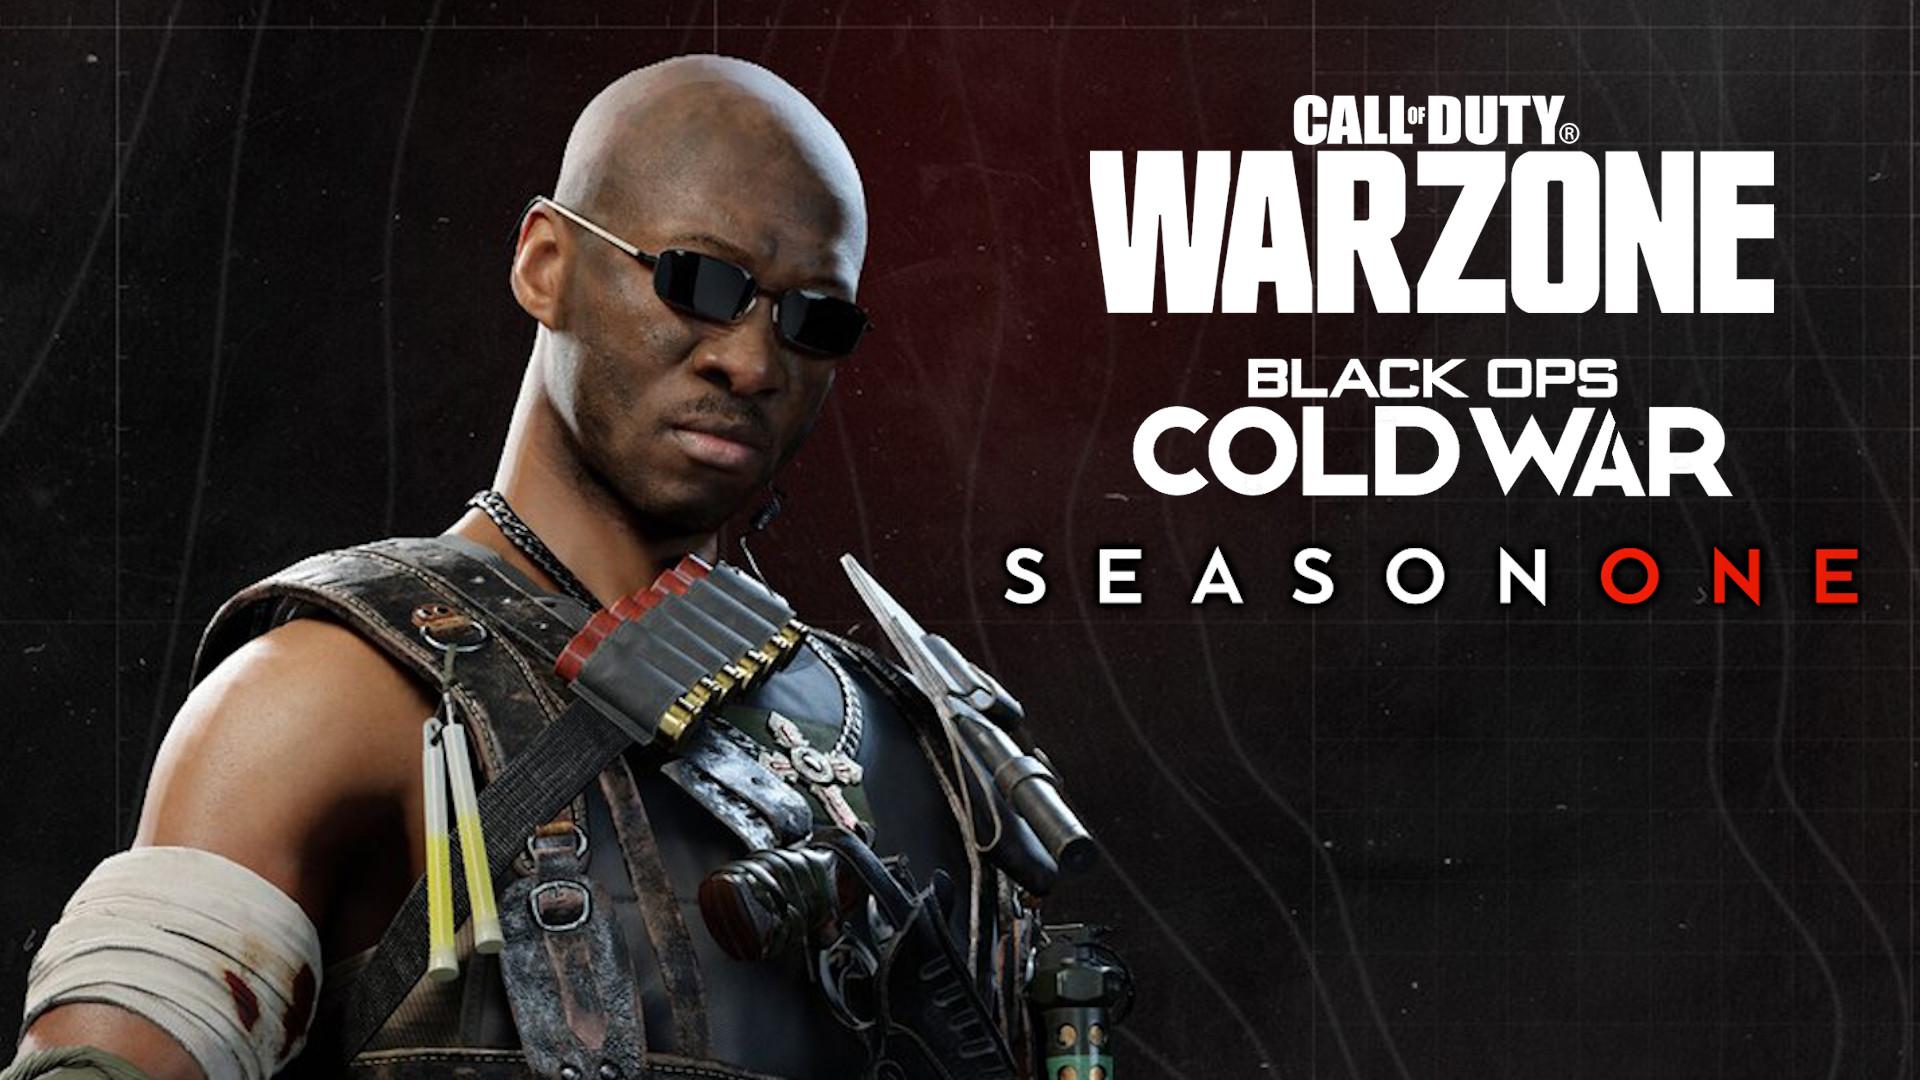 call of duty black ops cold war warzone season 1